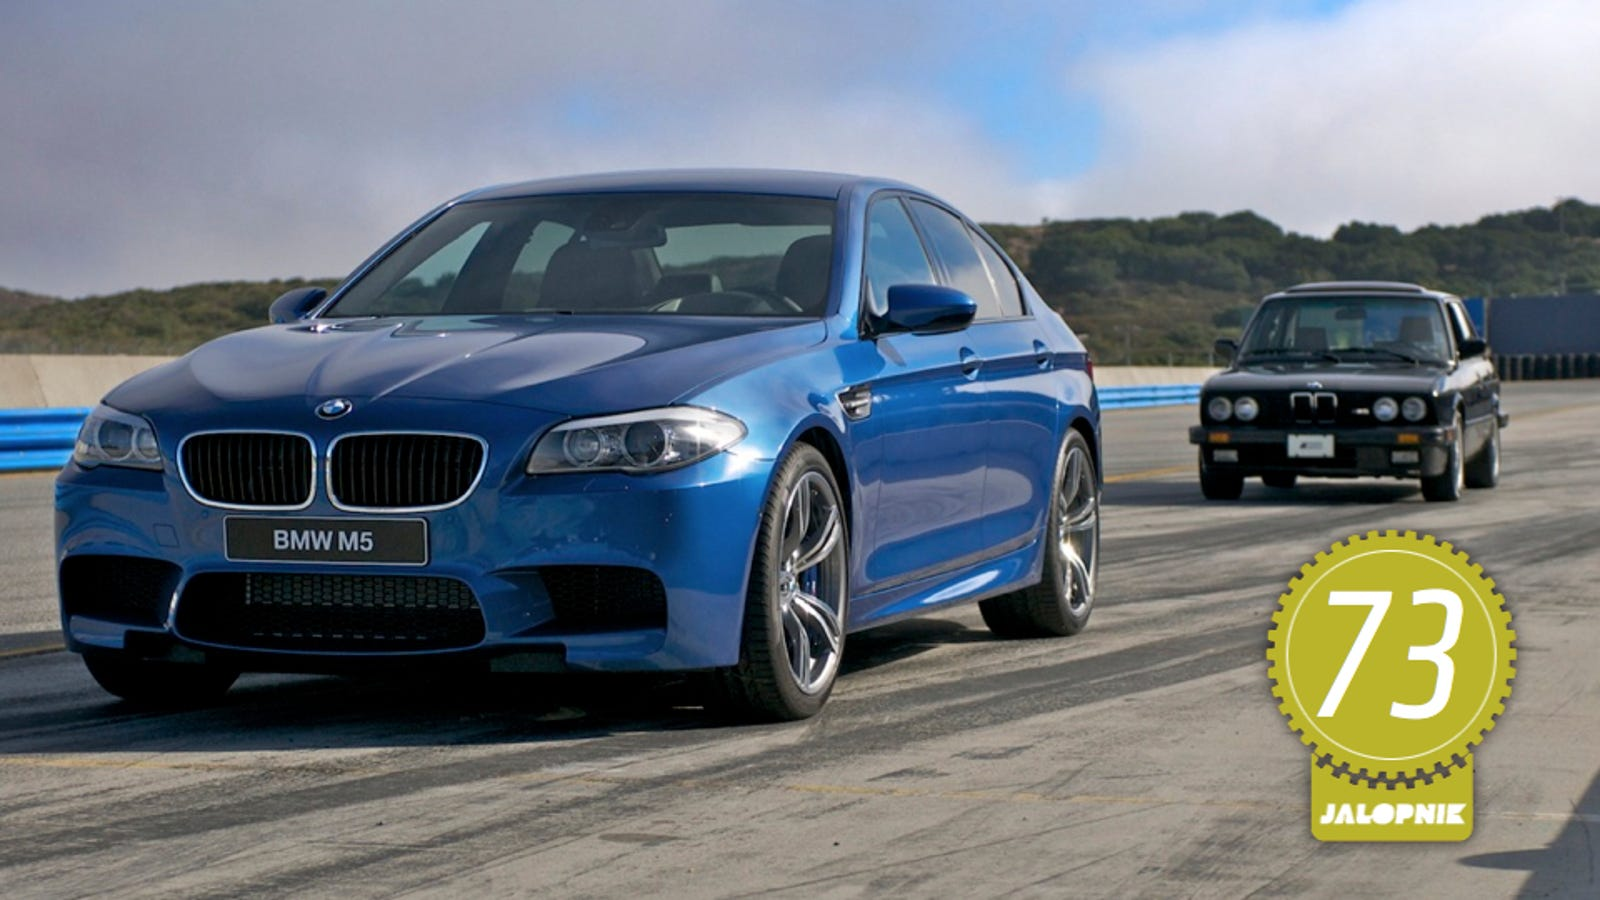 2013 BMW M5: The Jalopnik Review